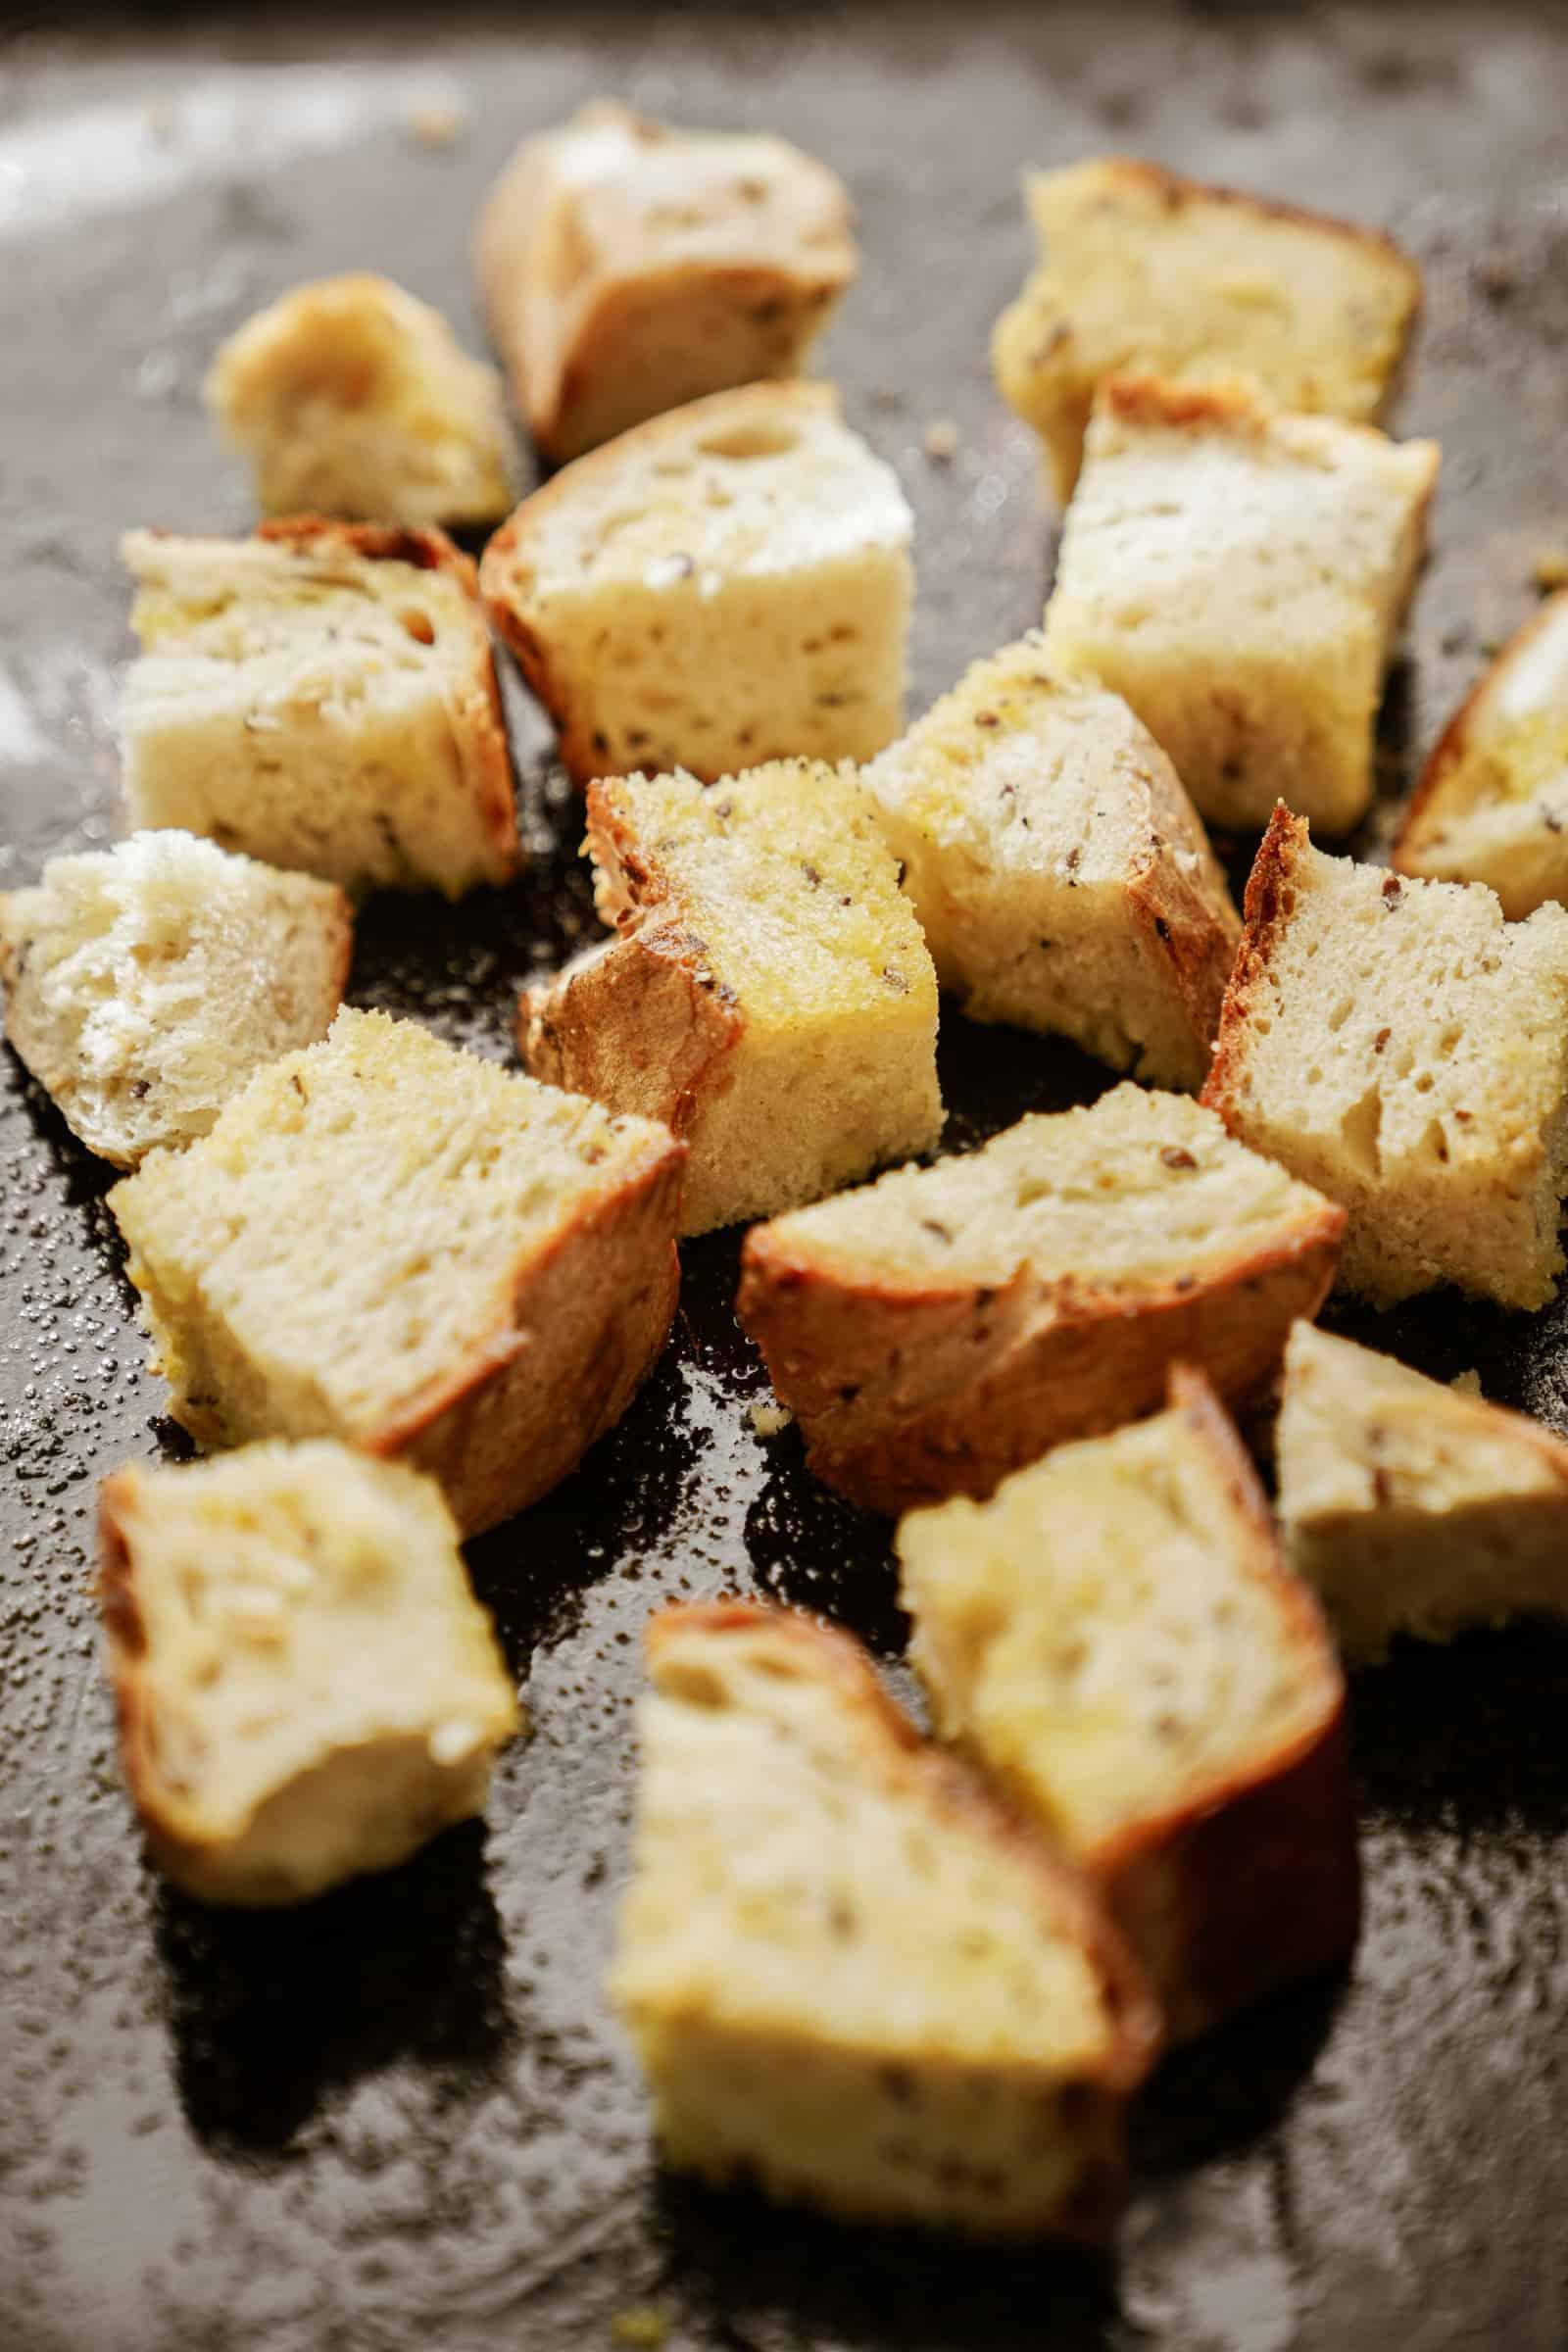 Crispy croutons on a baking sheet